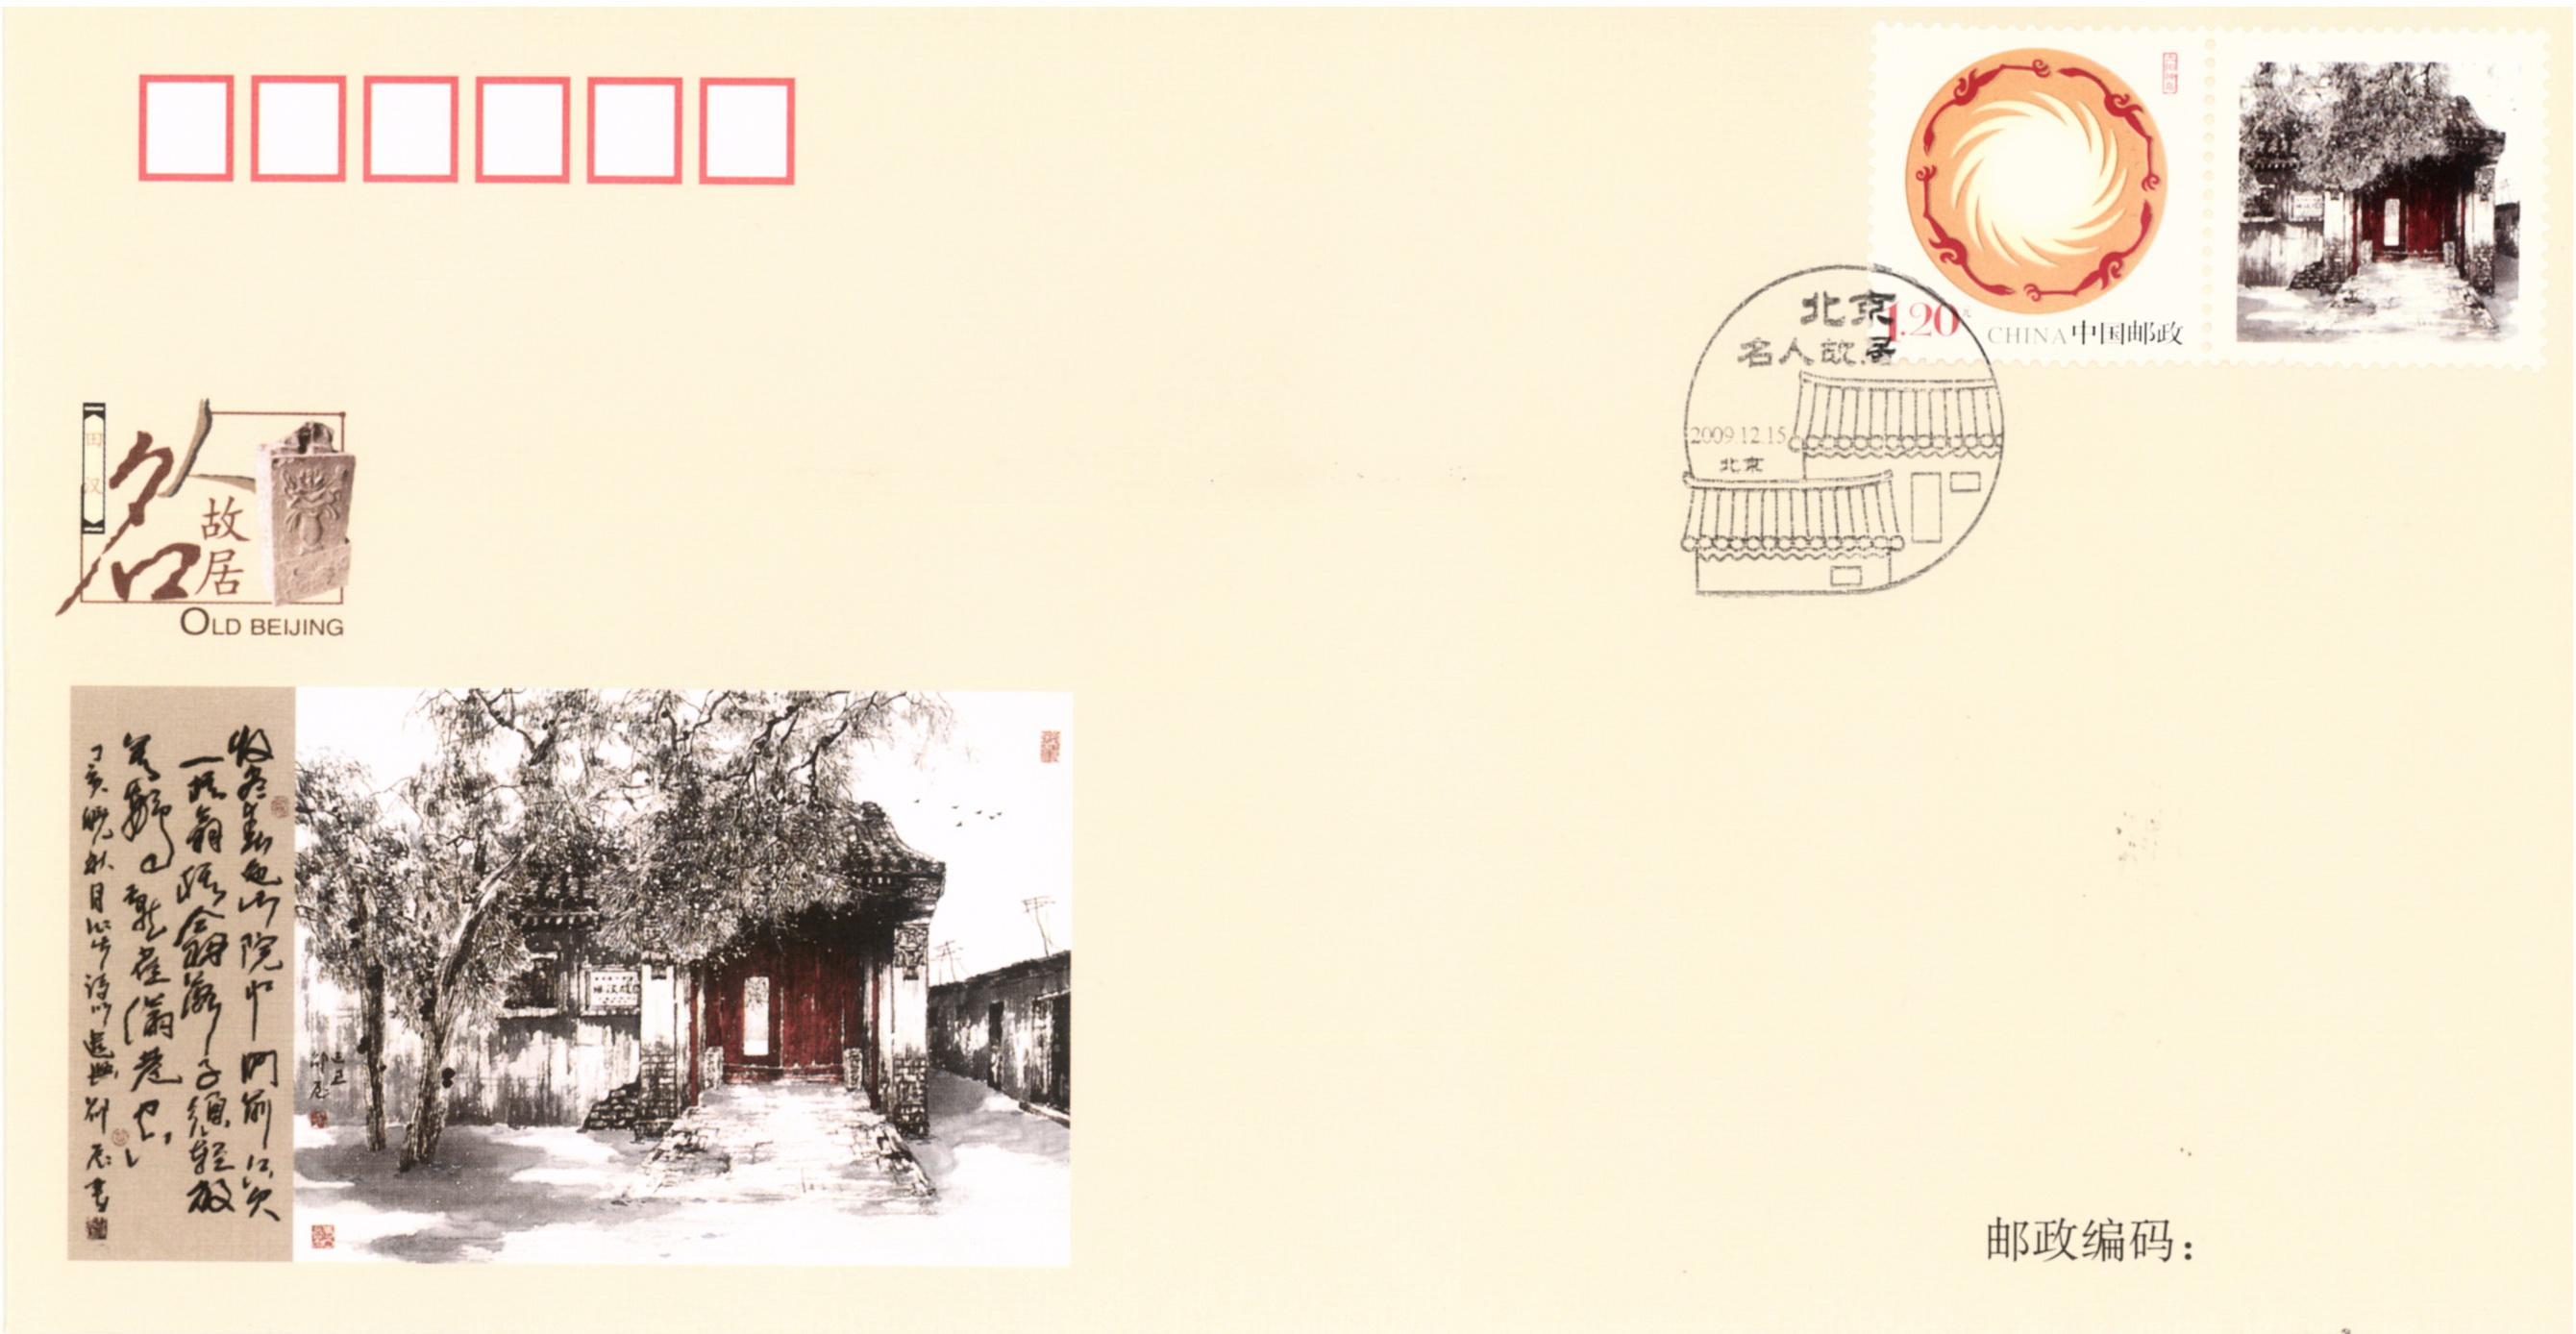 Residence of Tian Han